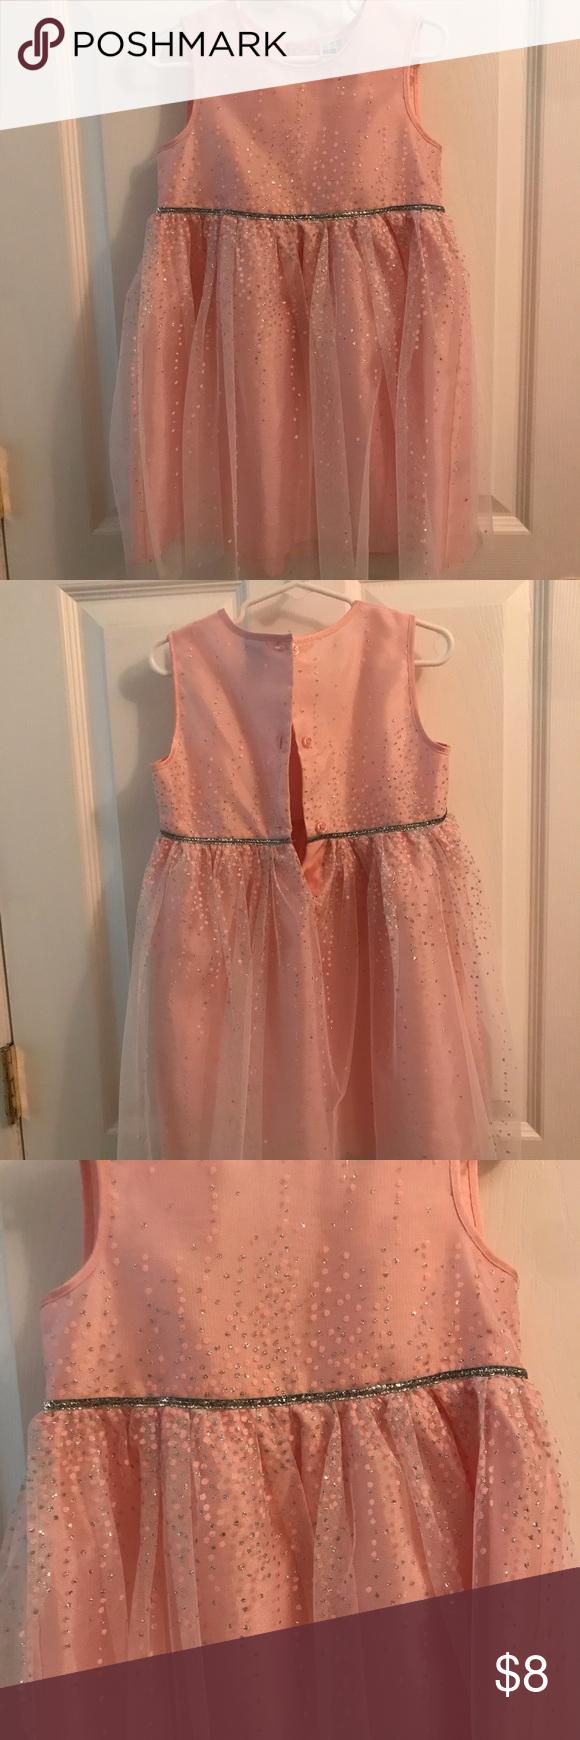 4t Never Worn Pink Dress With Sparkly Polkadots Pink Dress Wear Pink Dresses [ 1740 x 580 Pixel ]